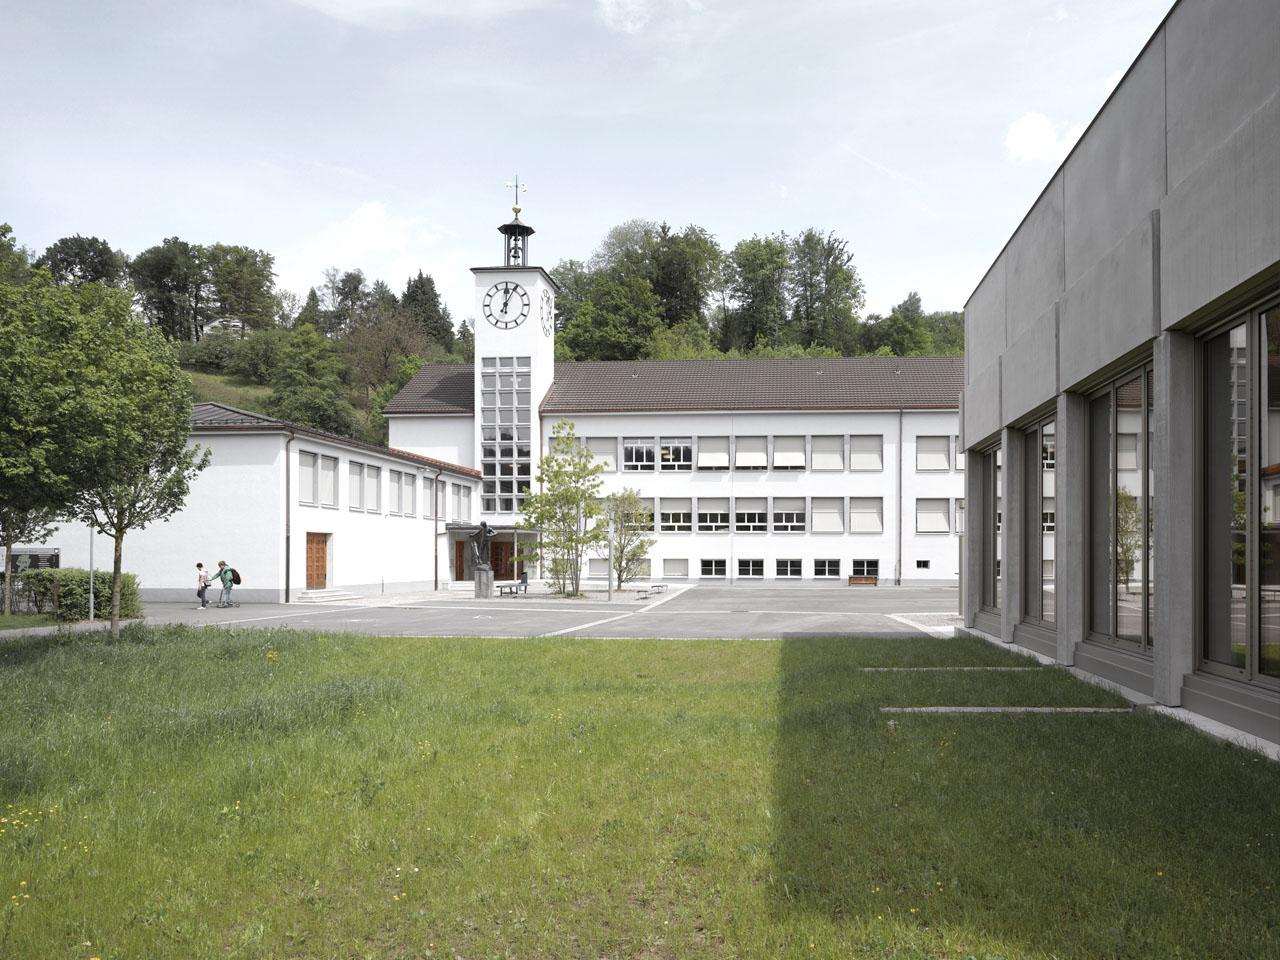 meierhug_architects_01